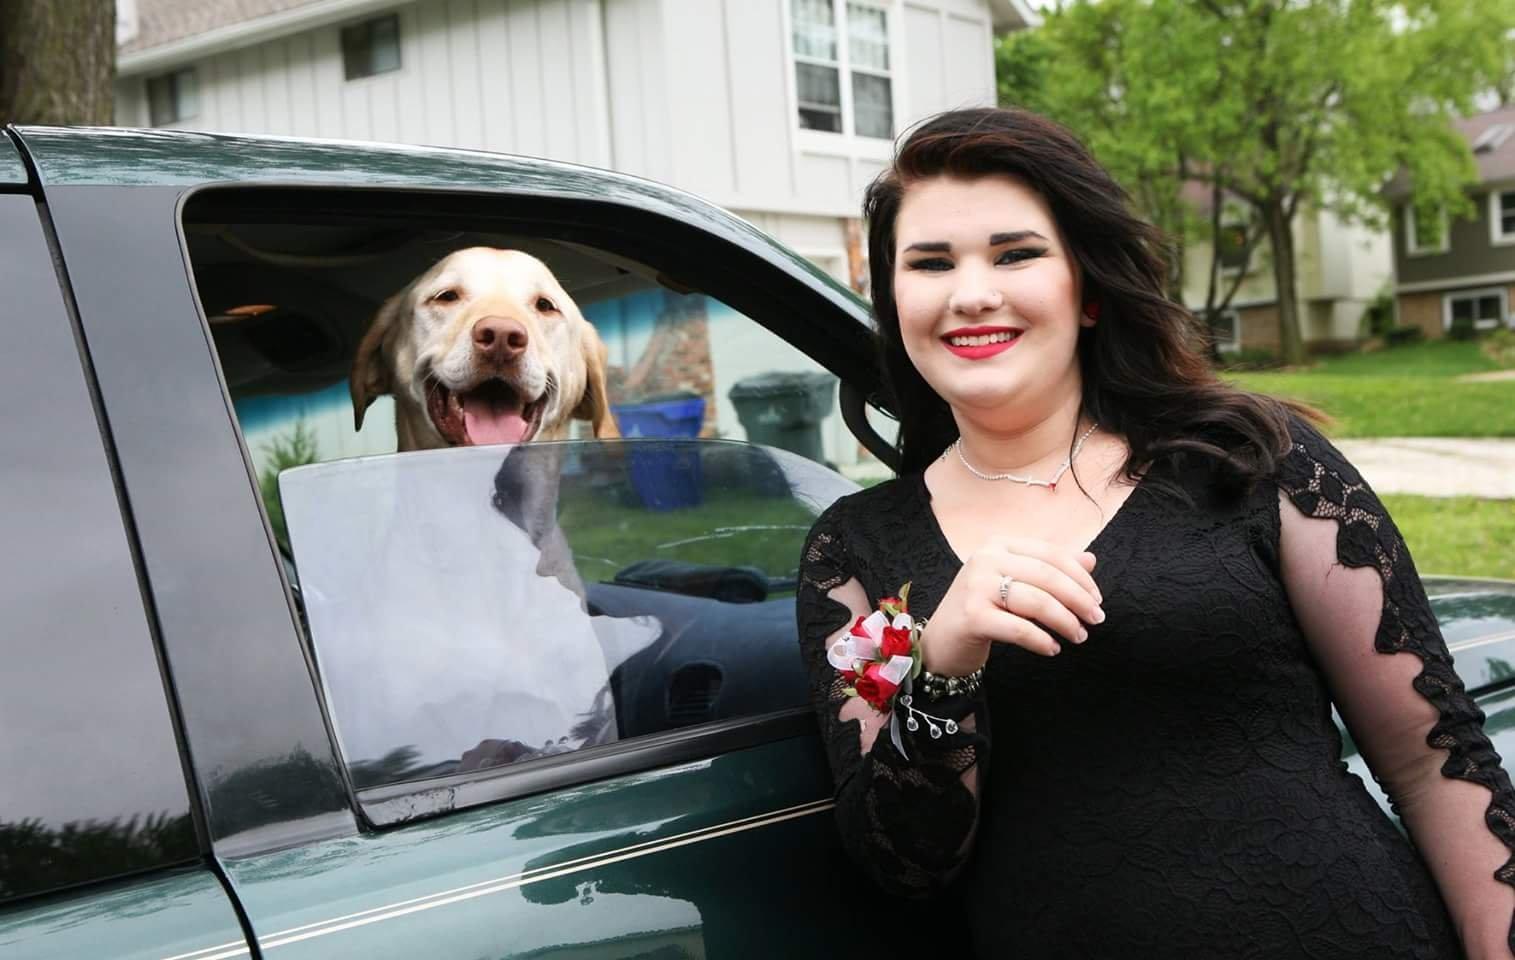 17-year-old dies in SUV wreck in Oak Grove - WBRC FOX6 News ...